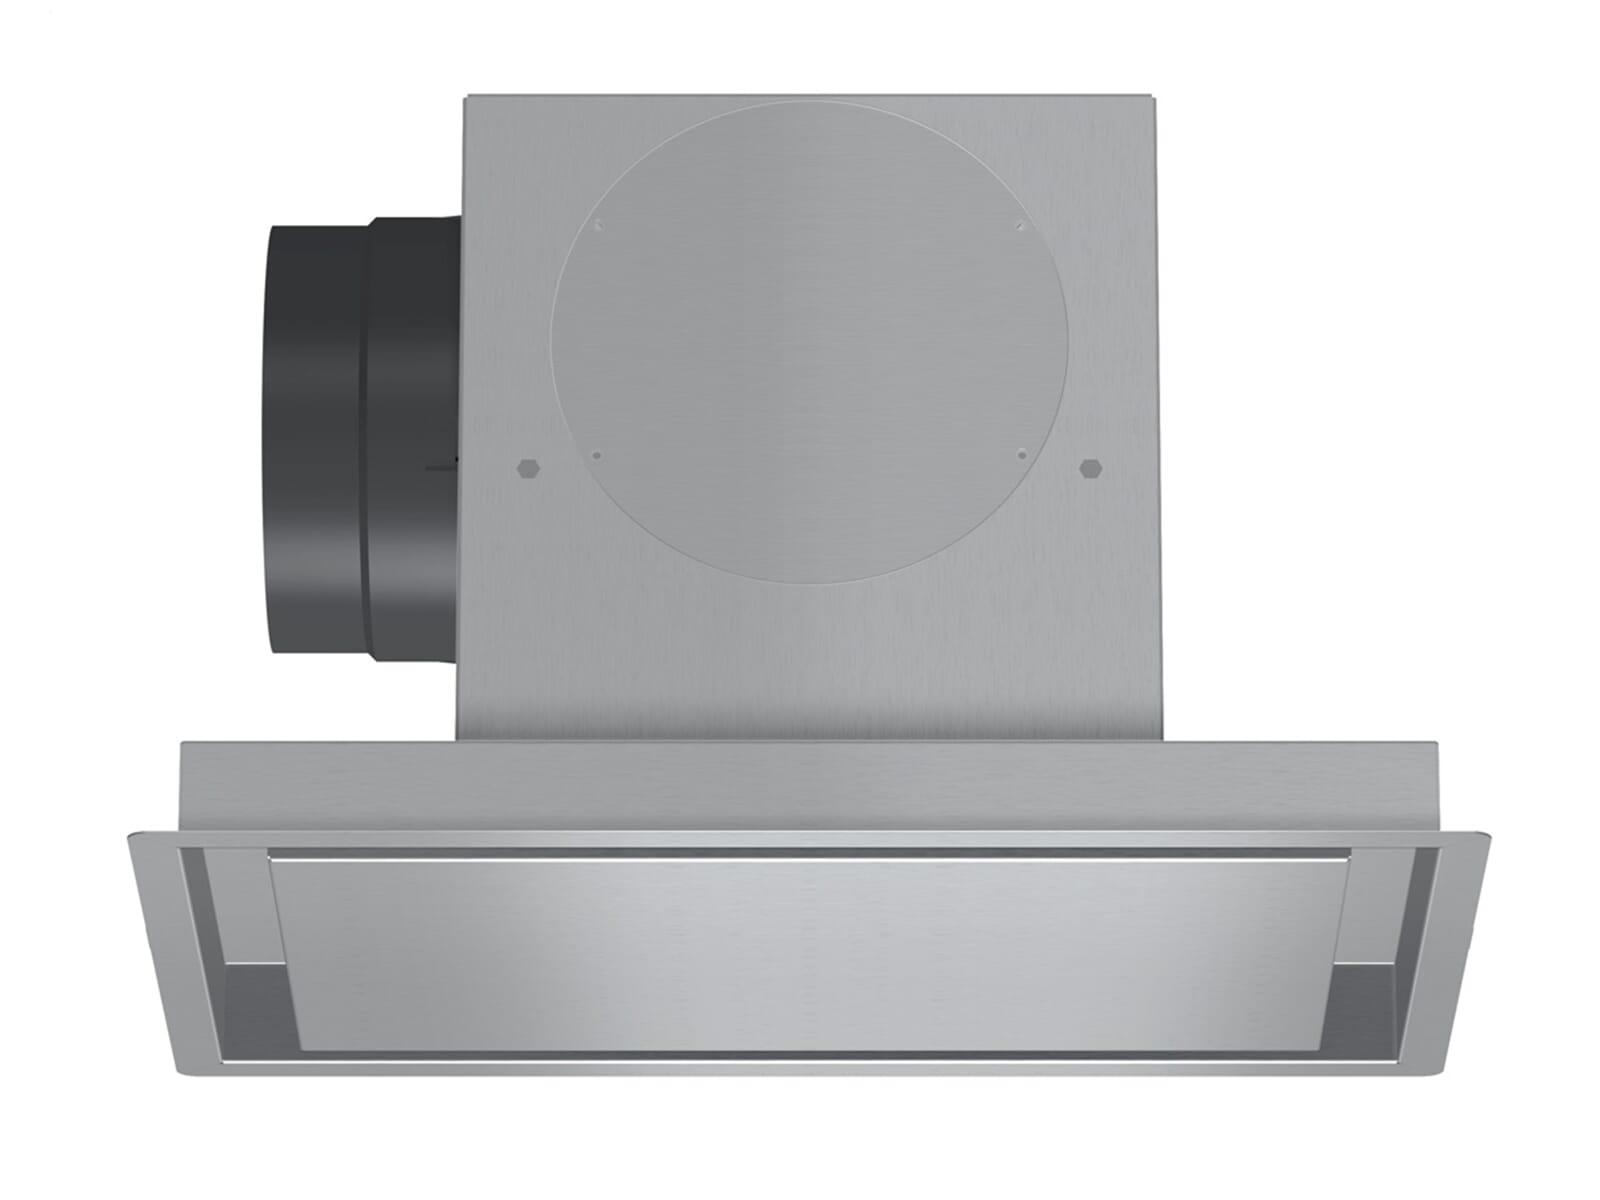 Produktabbildung Siemens LZ56700 cleanAir Umluftkamin